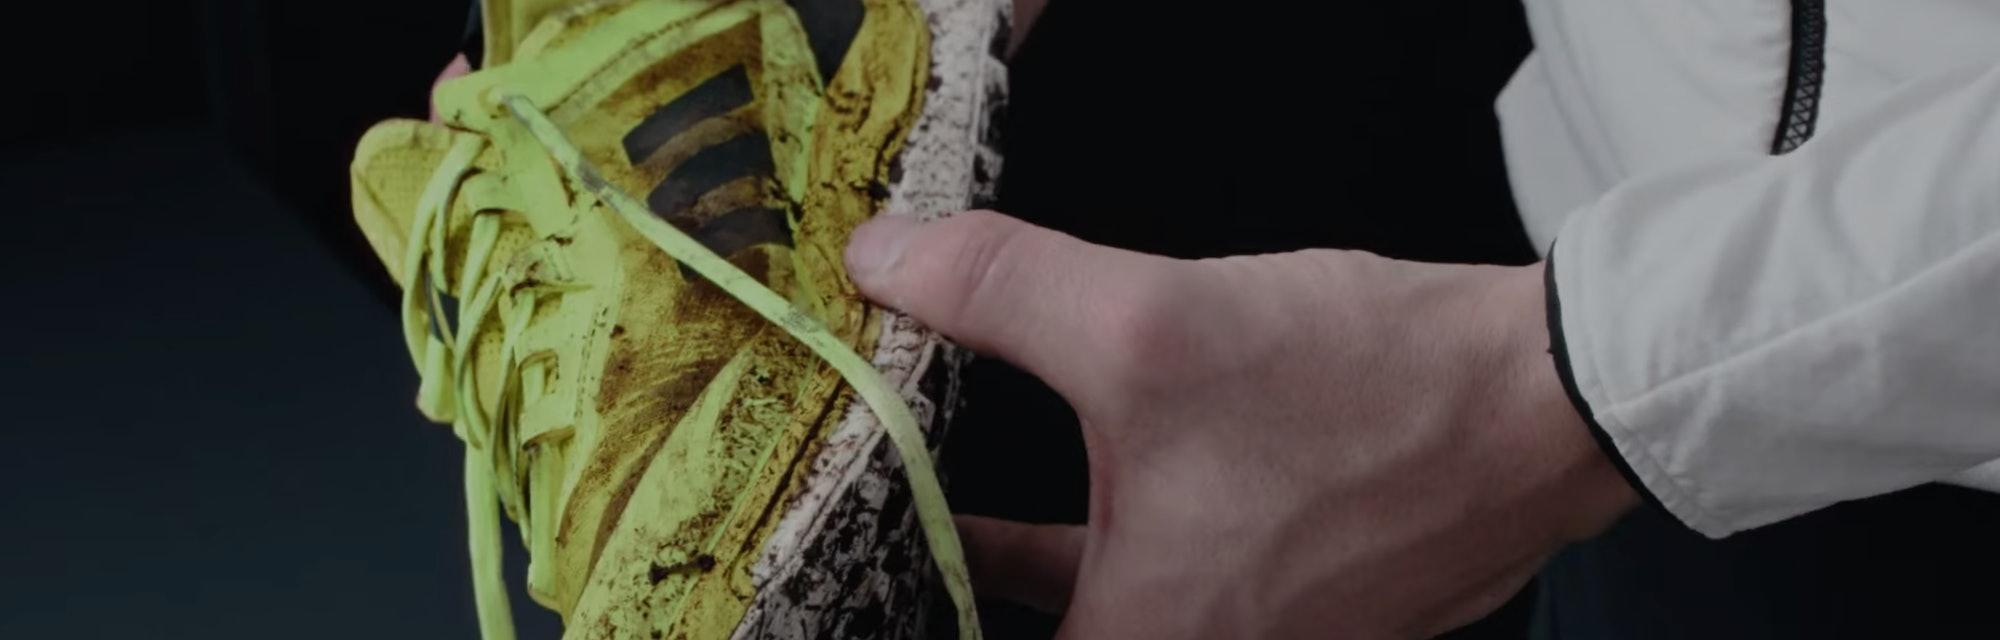 Adidas Terrex Rental Program